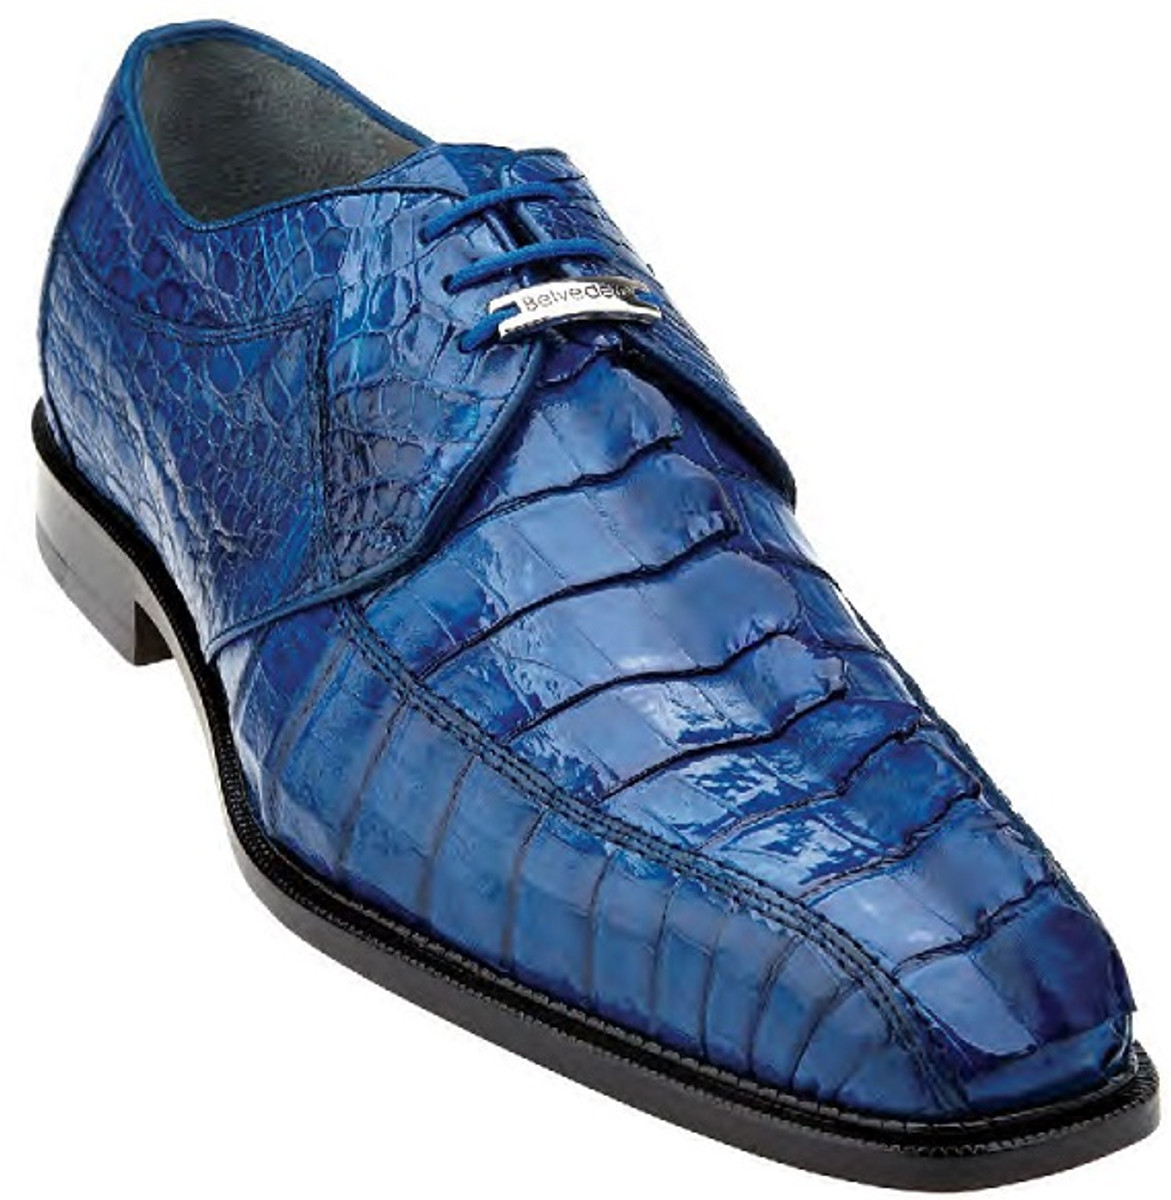 Belvedere Bright Blue Crocodile Shoes Mens Hornback Top Columbo